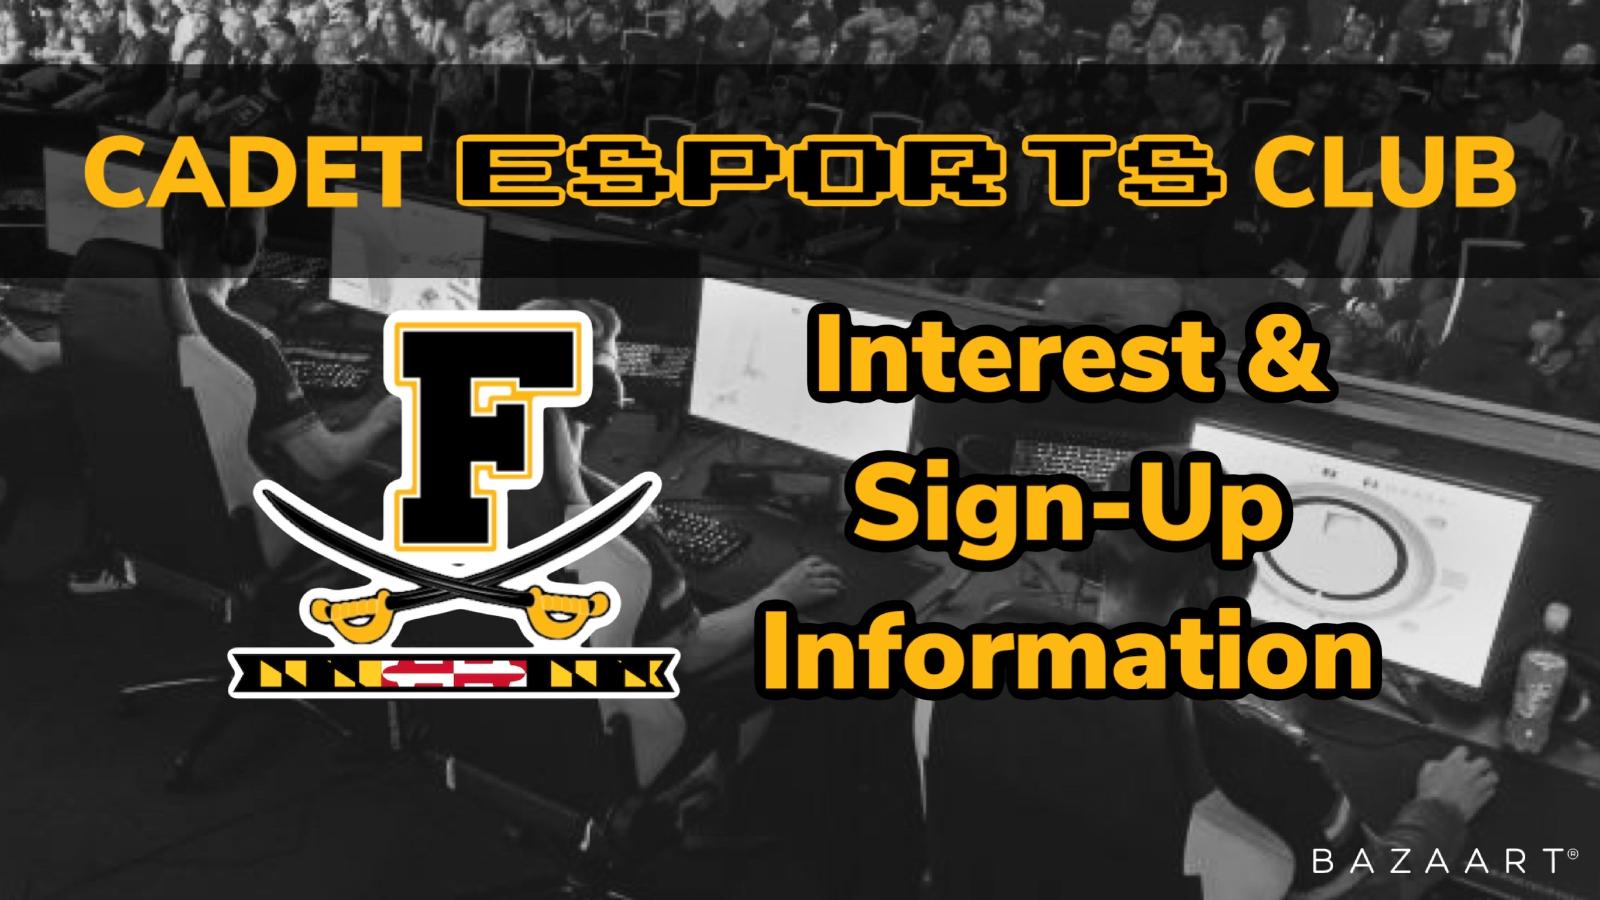 Cadet ESport Club Interest & Sign-Up Information